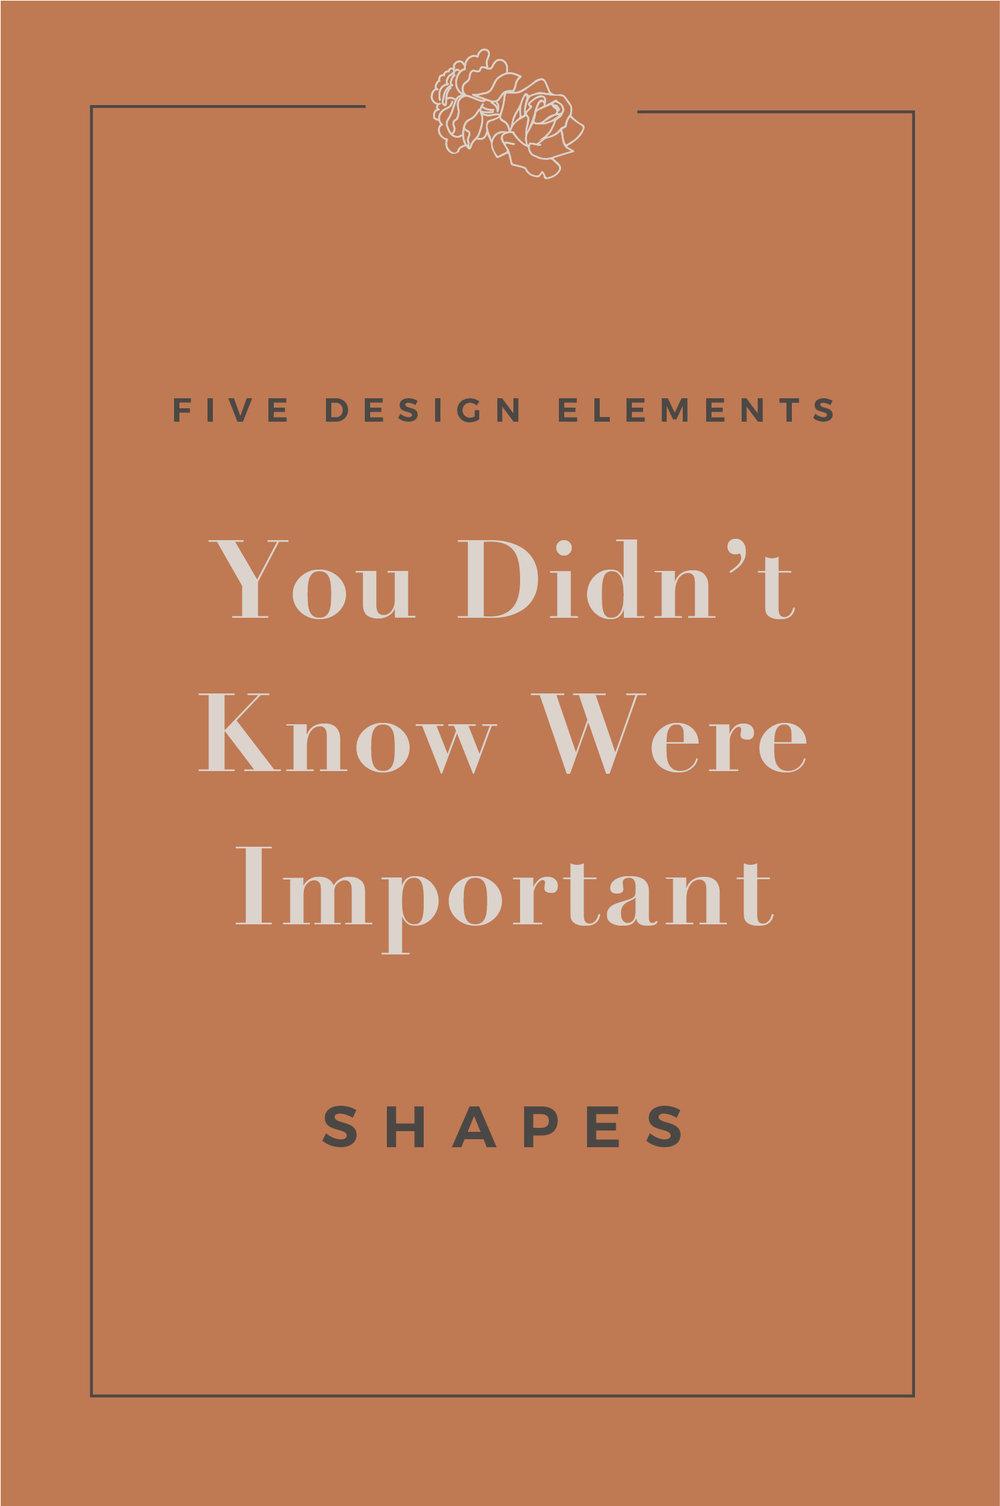 Thumb-Blogpost-Fivedesignelements-Shape-01.jpg